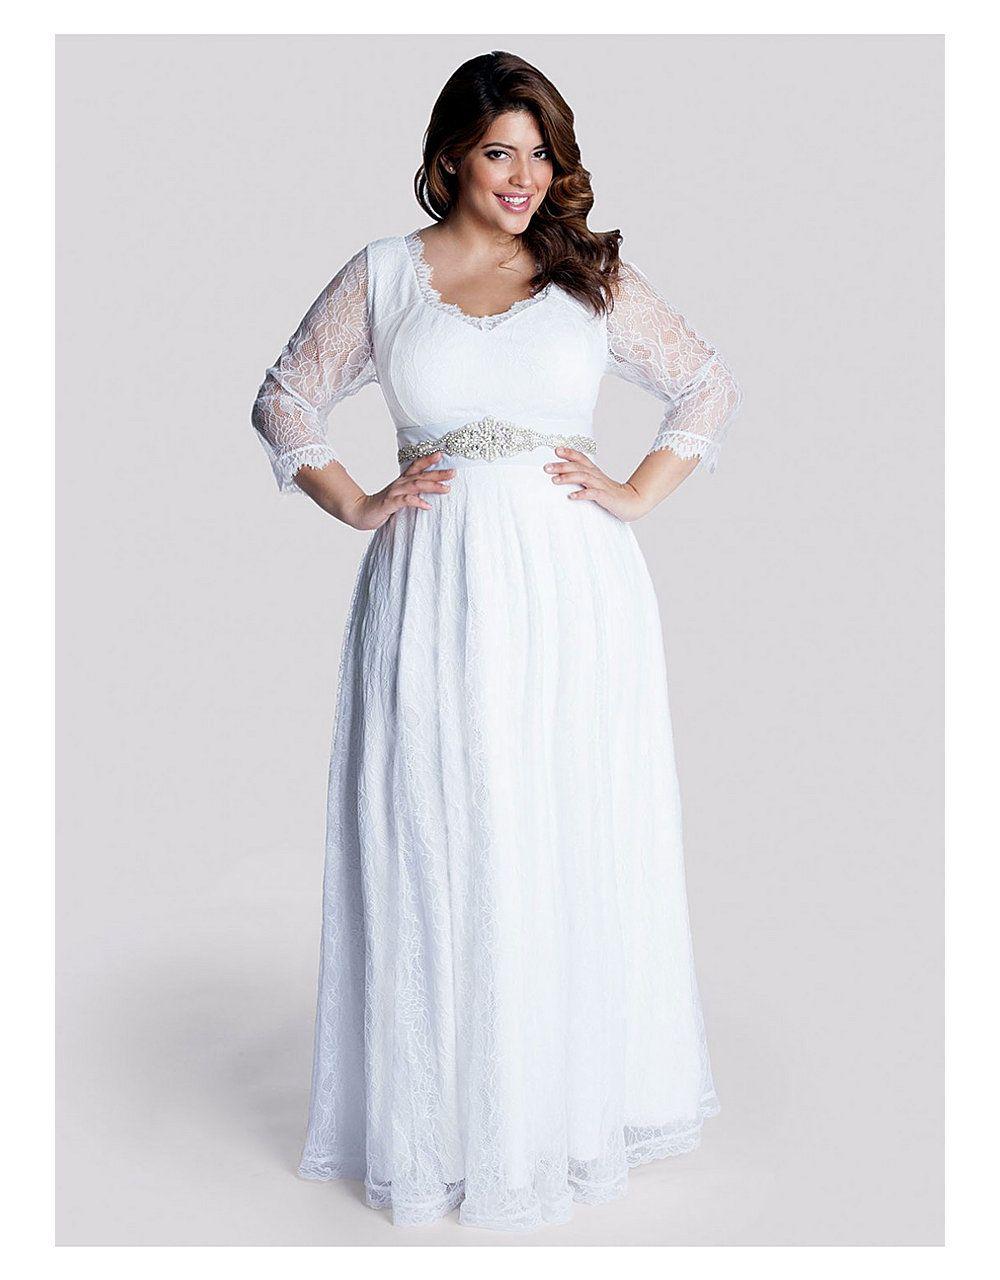 Rosalie Wedding Gown Sonsi Plus Size Wedding Dresses With Sleeves Wedding Dress Long Sleeve Wedding Dresses Plus Size [ 1280 x 1000 Pixel ]